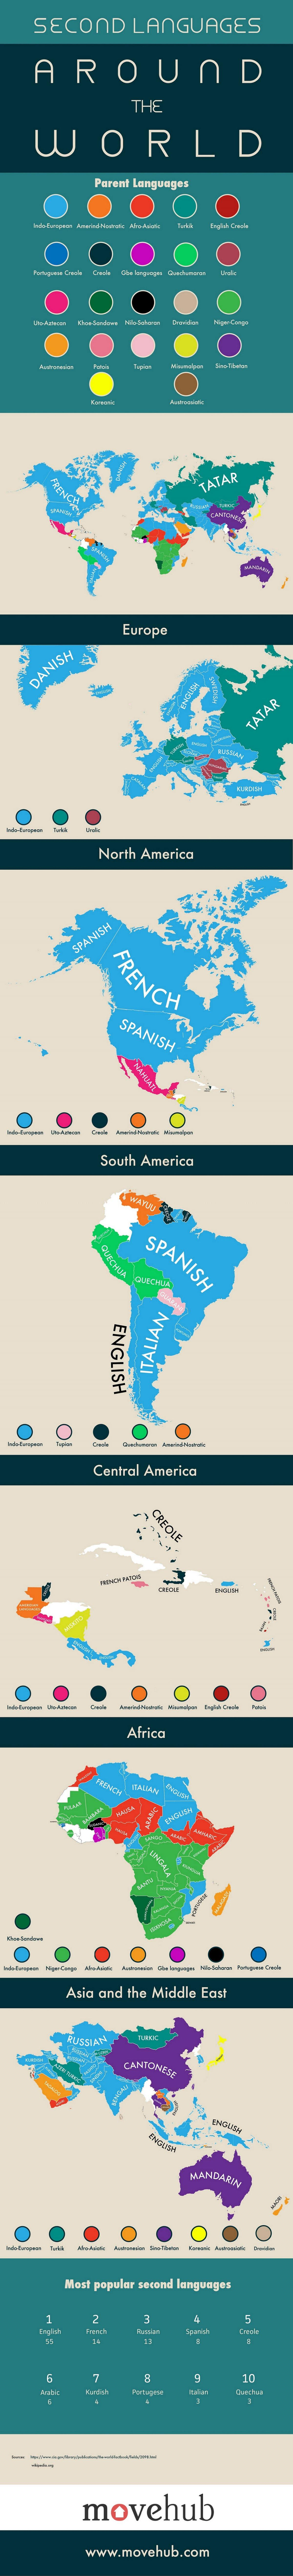 Infografica Seconda Lingua